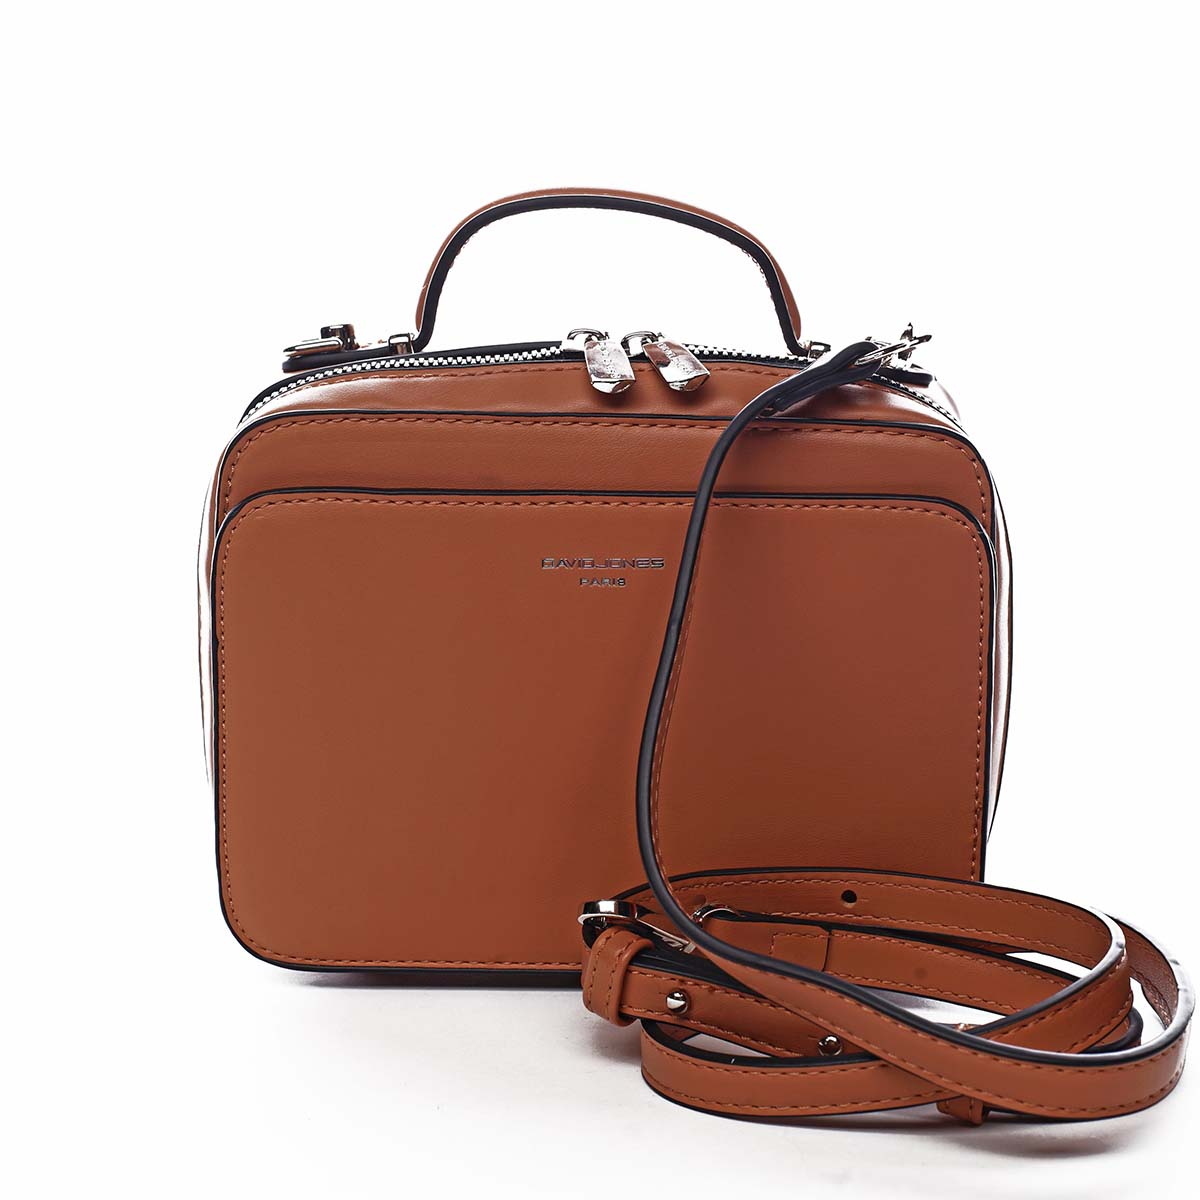 Dámská kabelka oranžová - David Jones Zara